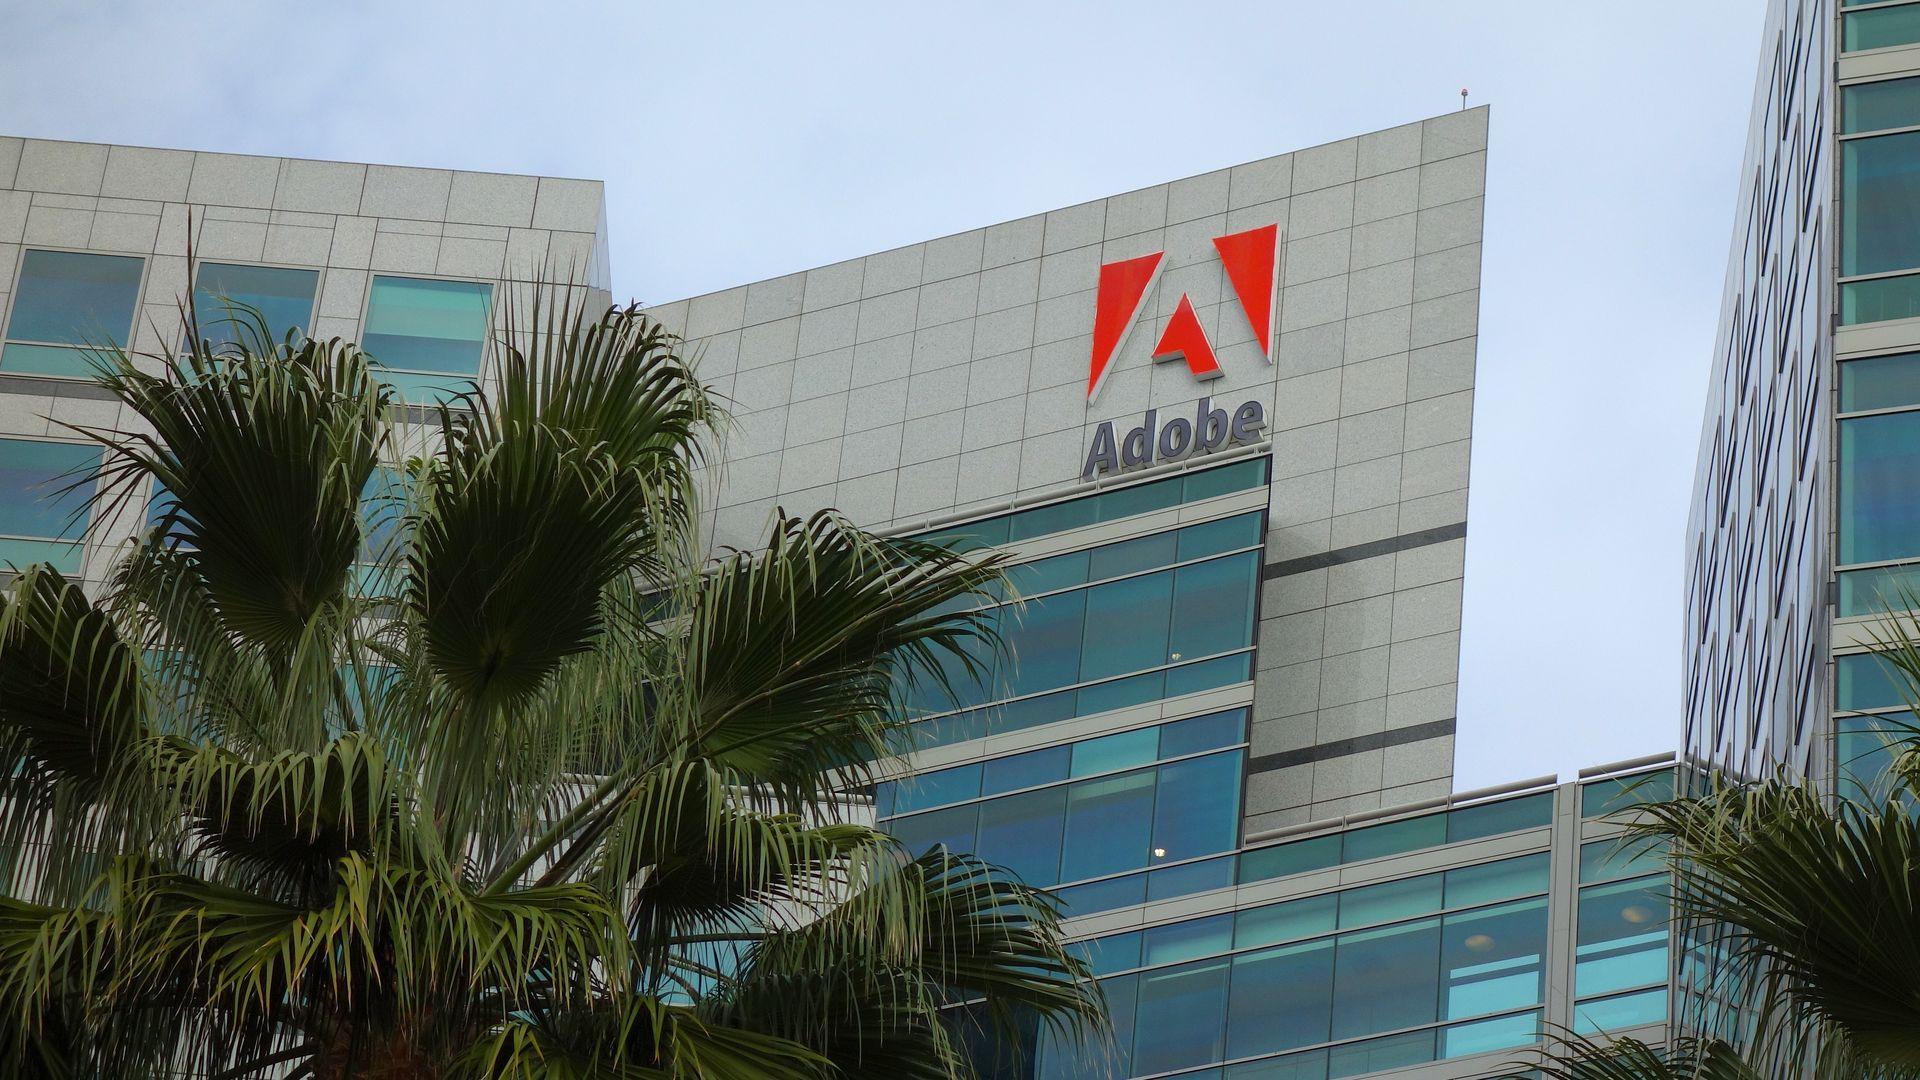 Adobe's San Jose Calif. headquarters